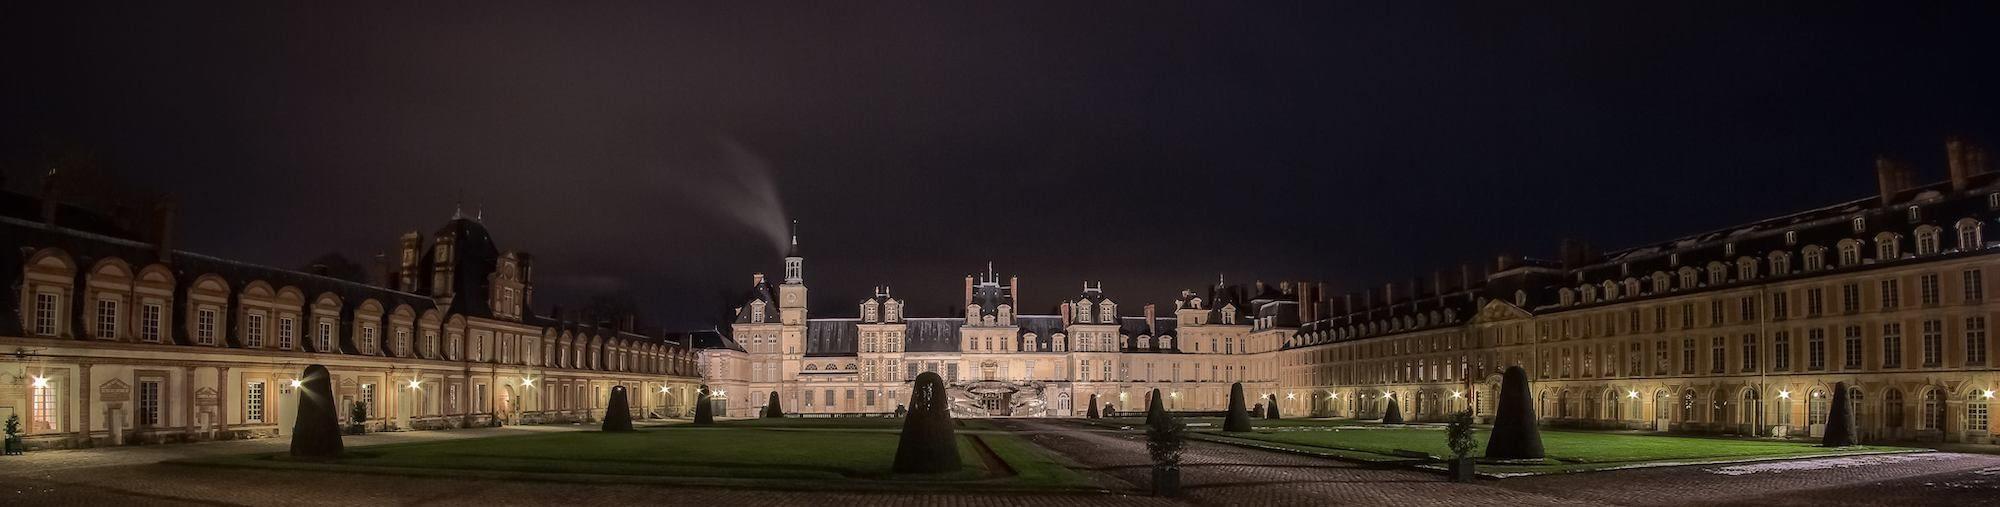 Château de Fontainebleau by night; it's beautifully lit.